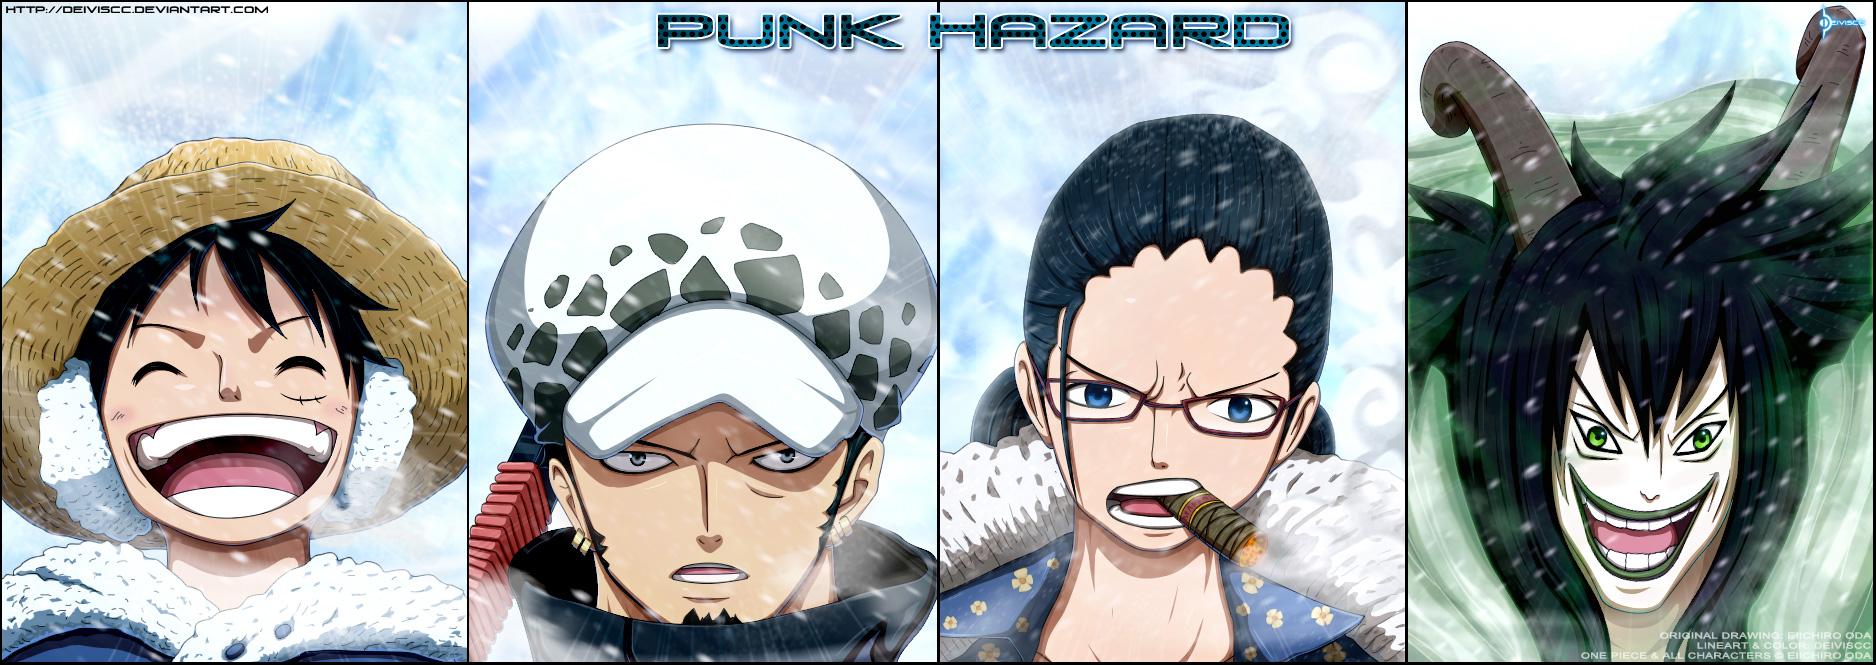 One Piece Chapter 671: Trái ác quỷ Gas Gas 018